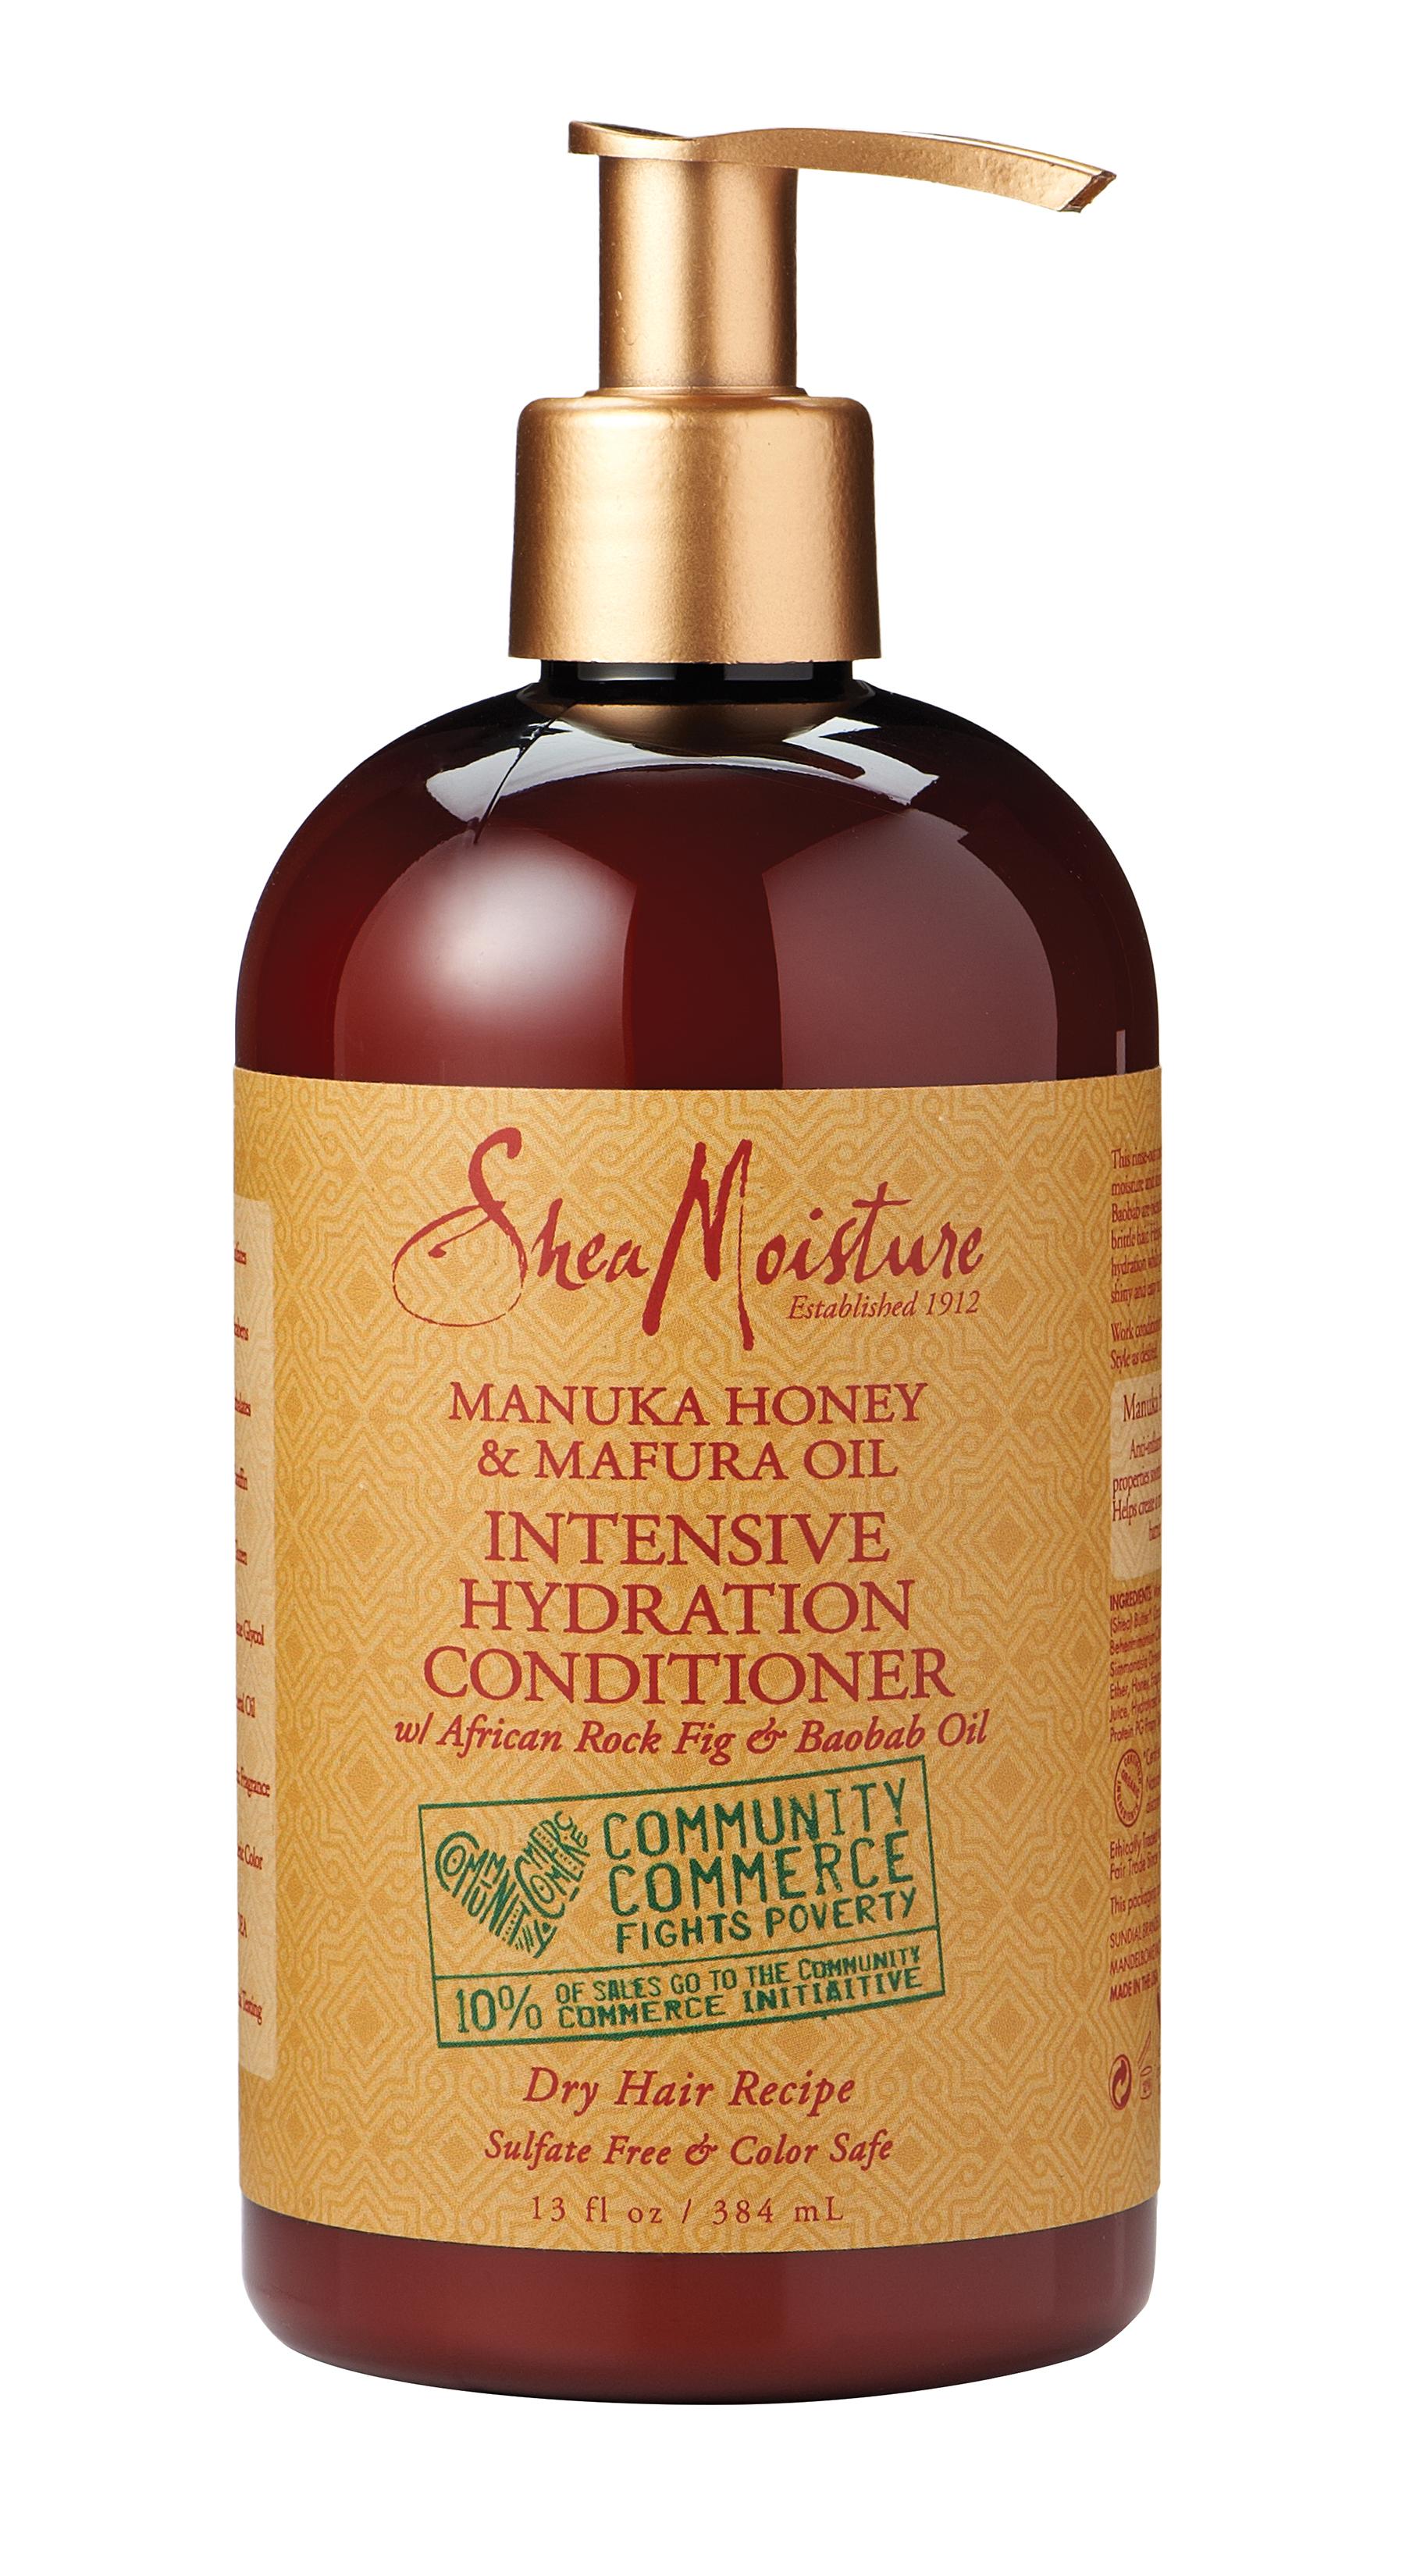 Jerly 2a: SheaMoisture Manuka Honey & Mafura Oil Hydration Intensive Conditioner